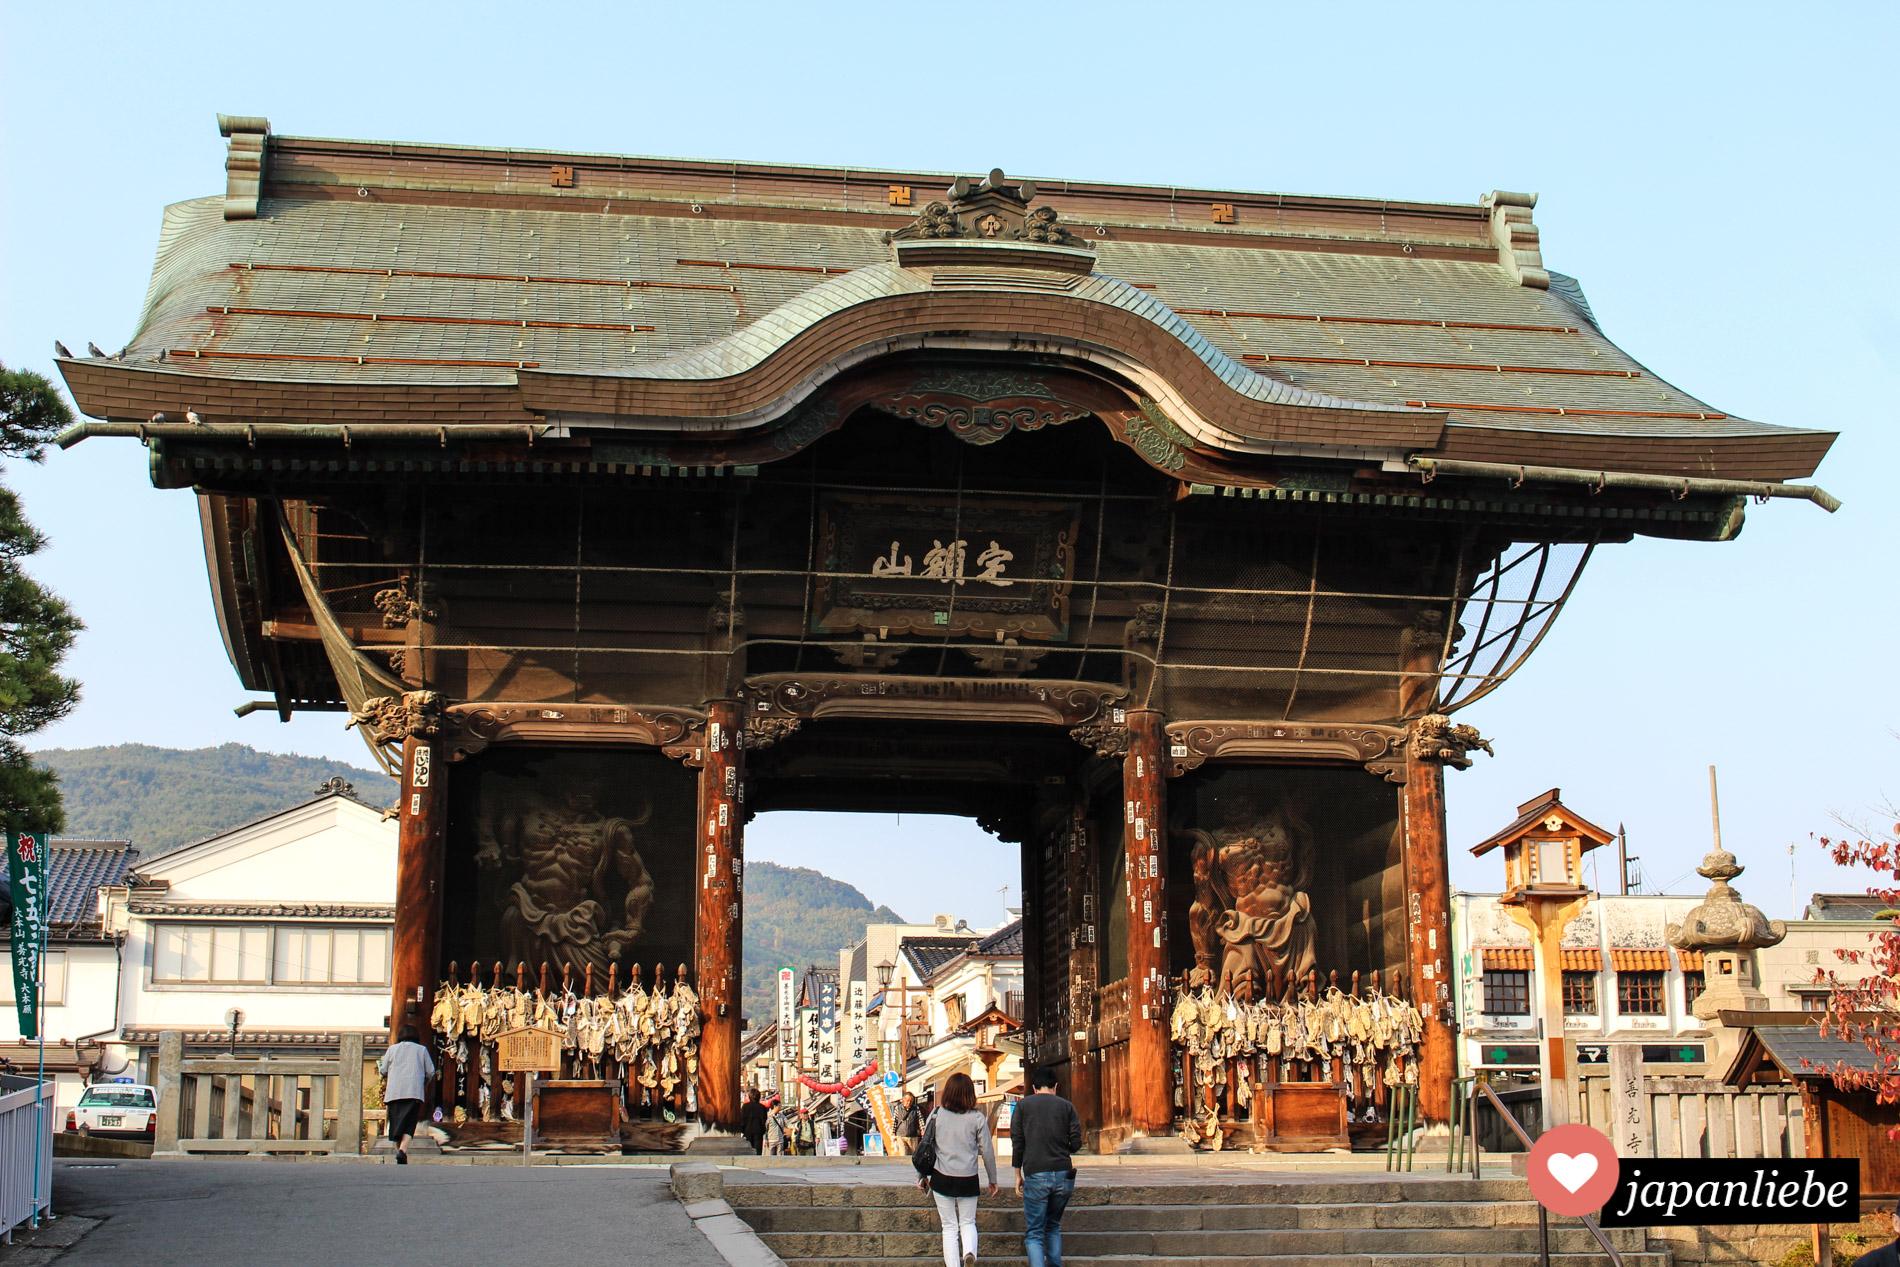 Das Tor zum Zenkoji Tempel in Nagano.